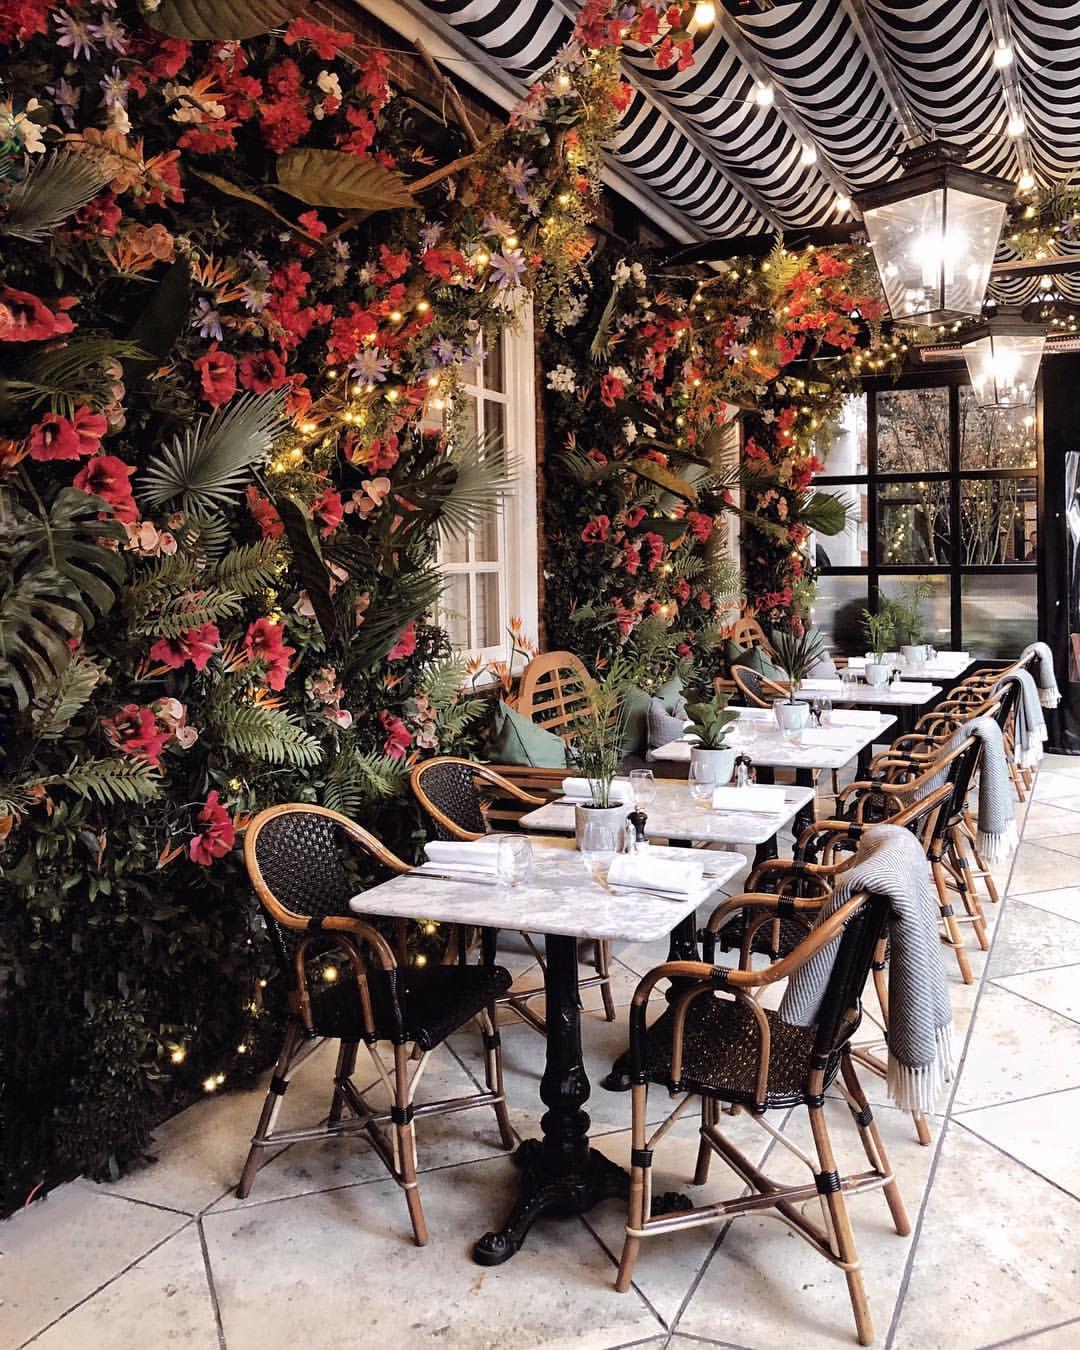 Dalloway Terrace, London, DallowaySpringJungle